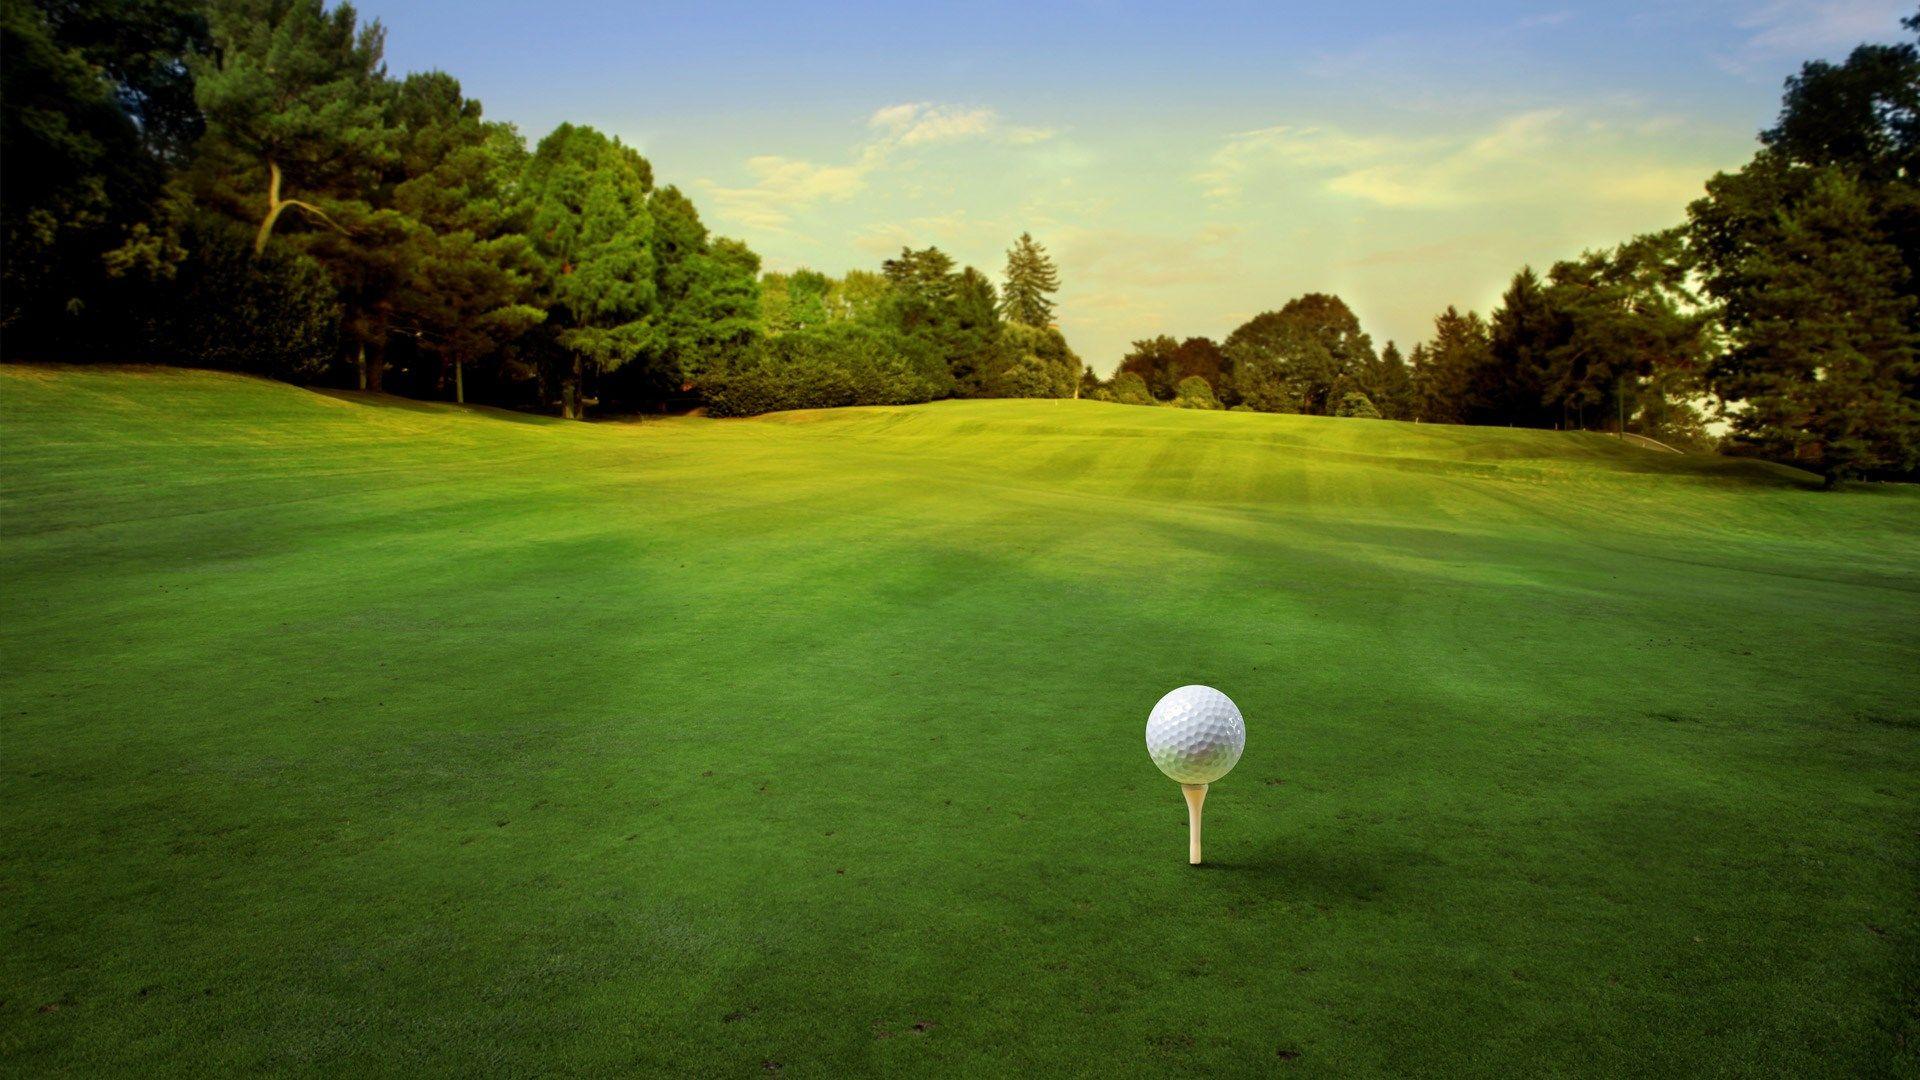 Golf Screen Backgrounds Free Golf Golf Instruction Golf Basics